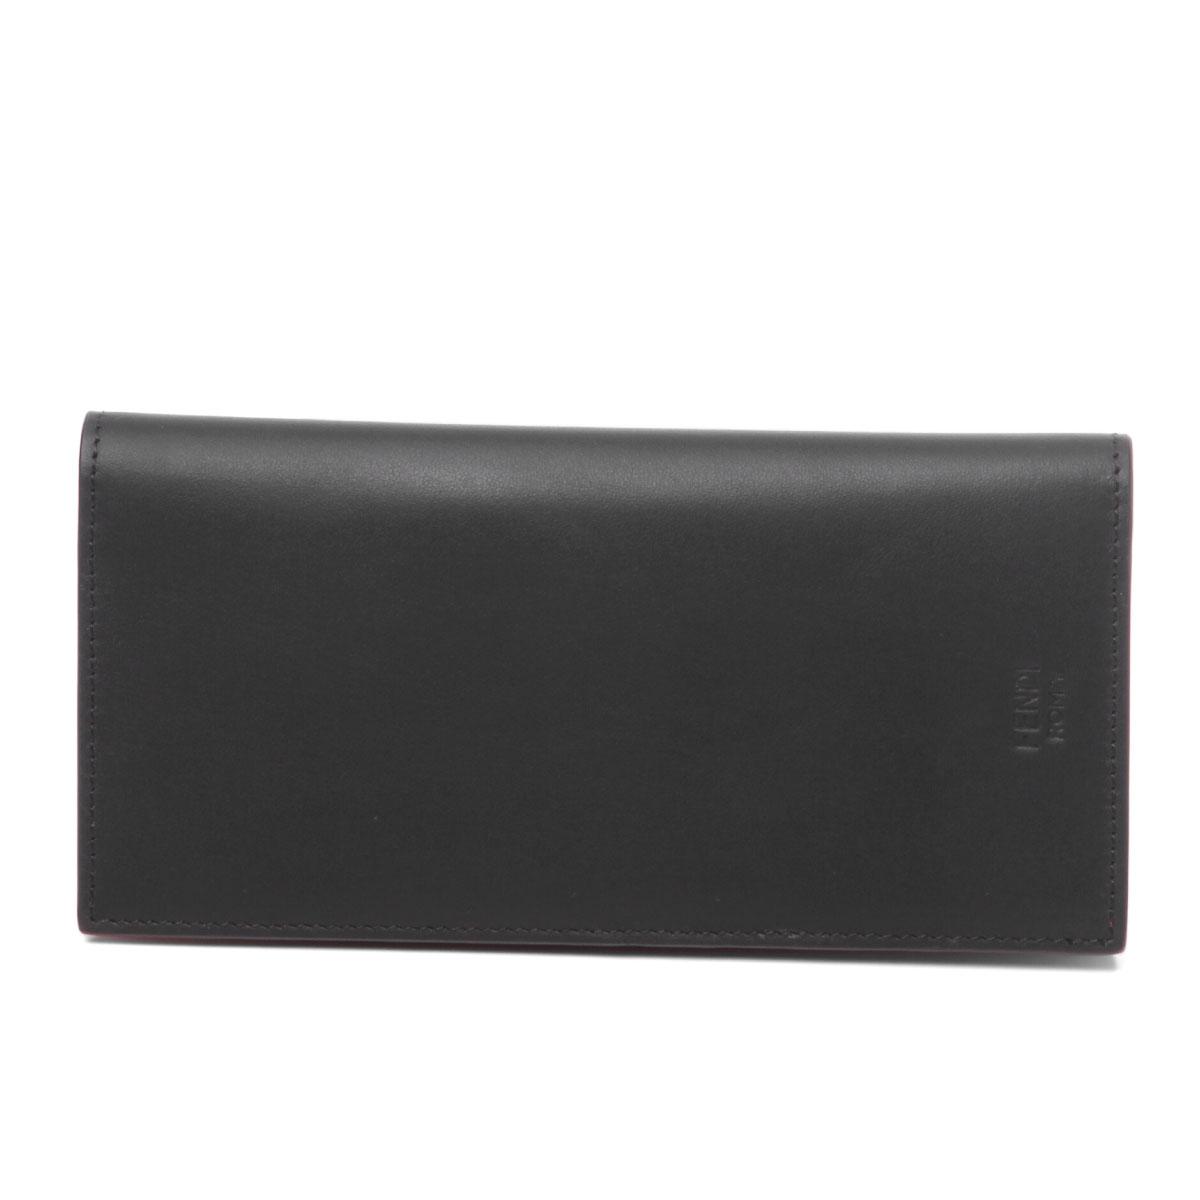 c8f1ae25 Fendi FENDI wallet men 7M0244 O73 F0U9T folio long wallet BAG BUGS bag bugs  NERO+GIALLO+ROSSO black